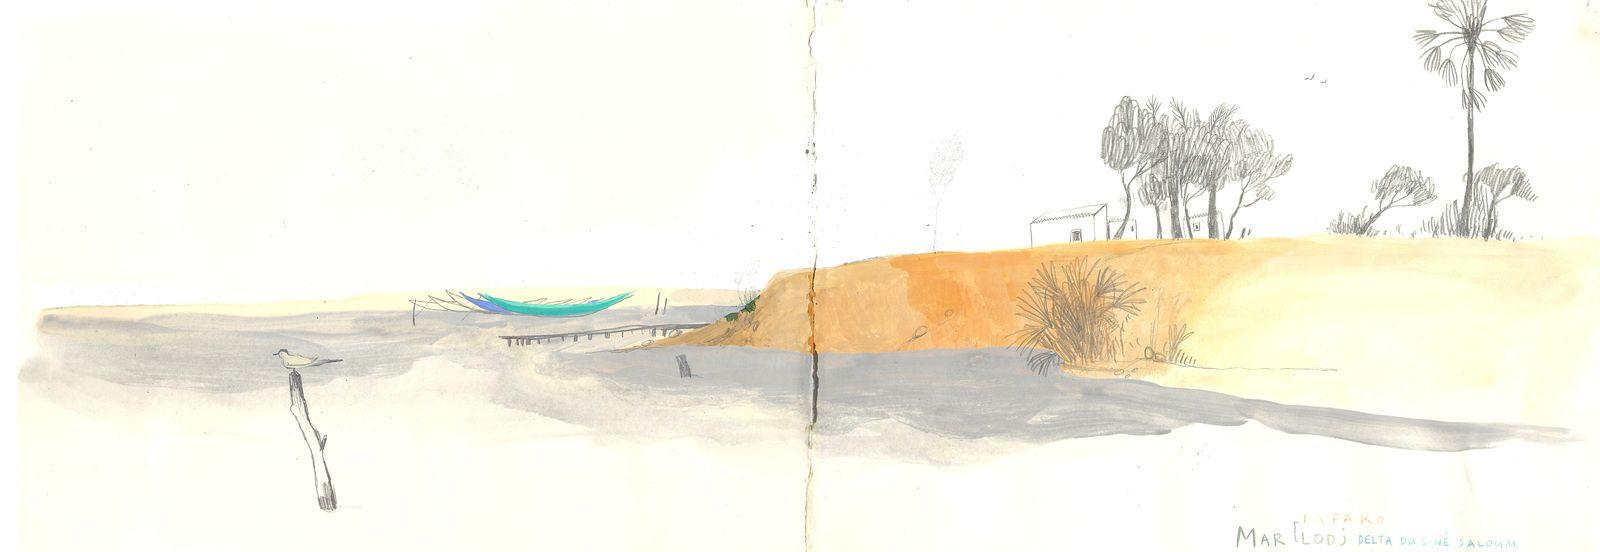 Sénégal, 2009, crayon, peinture acrylique